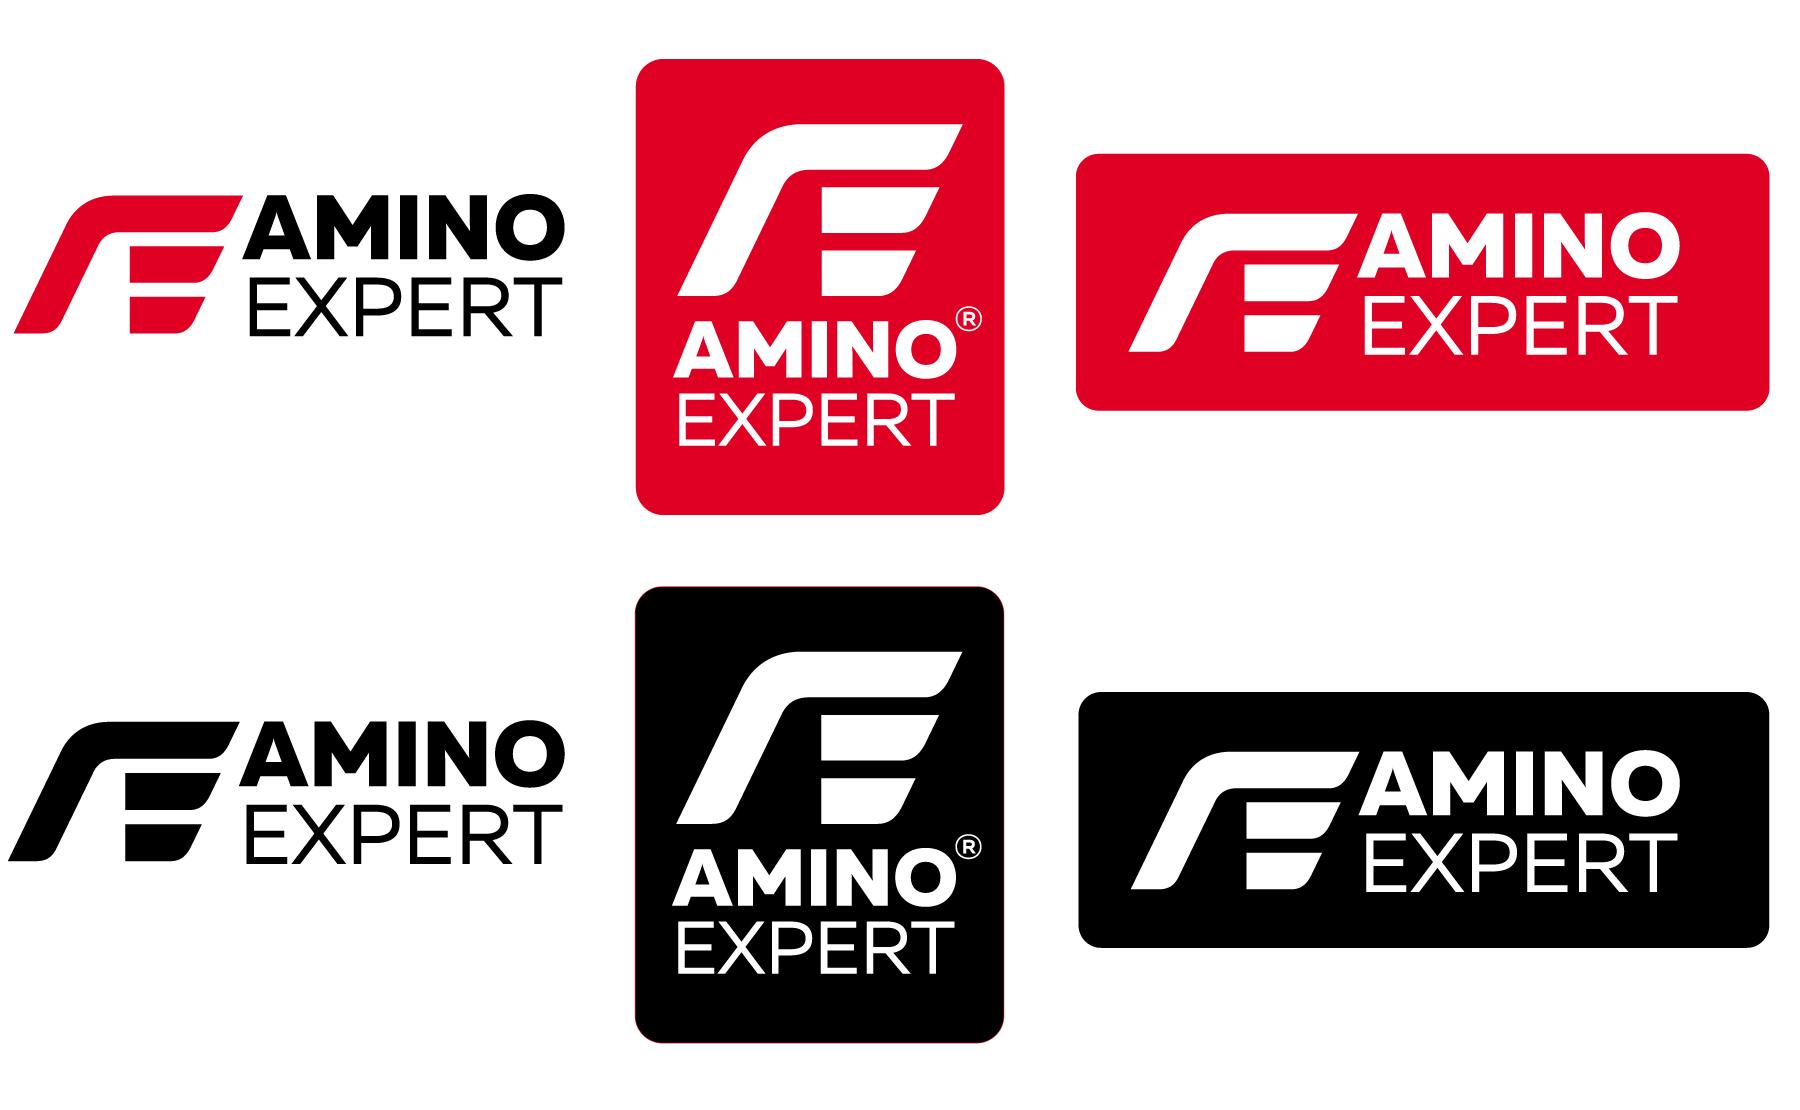 Amino expert. Графичен знак и логотип. Цветен и монохромен вариант.